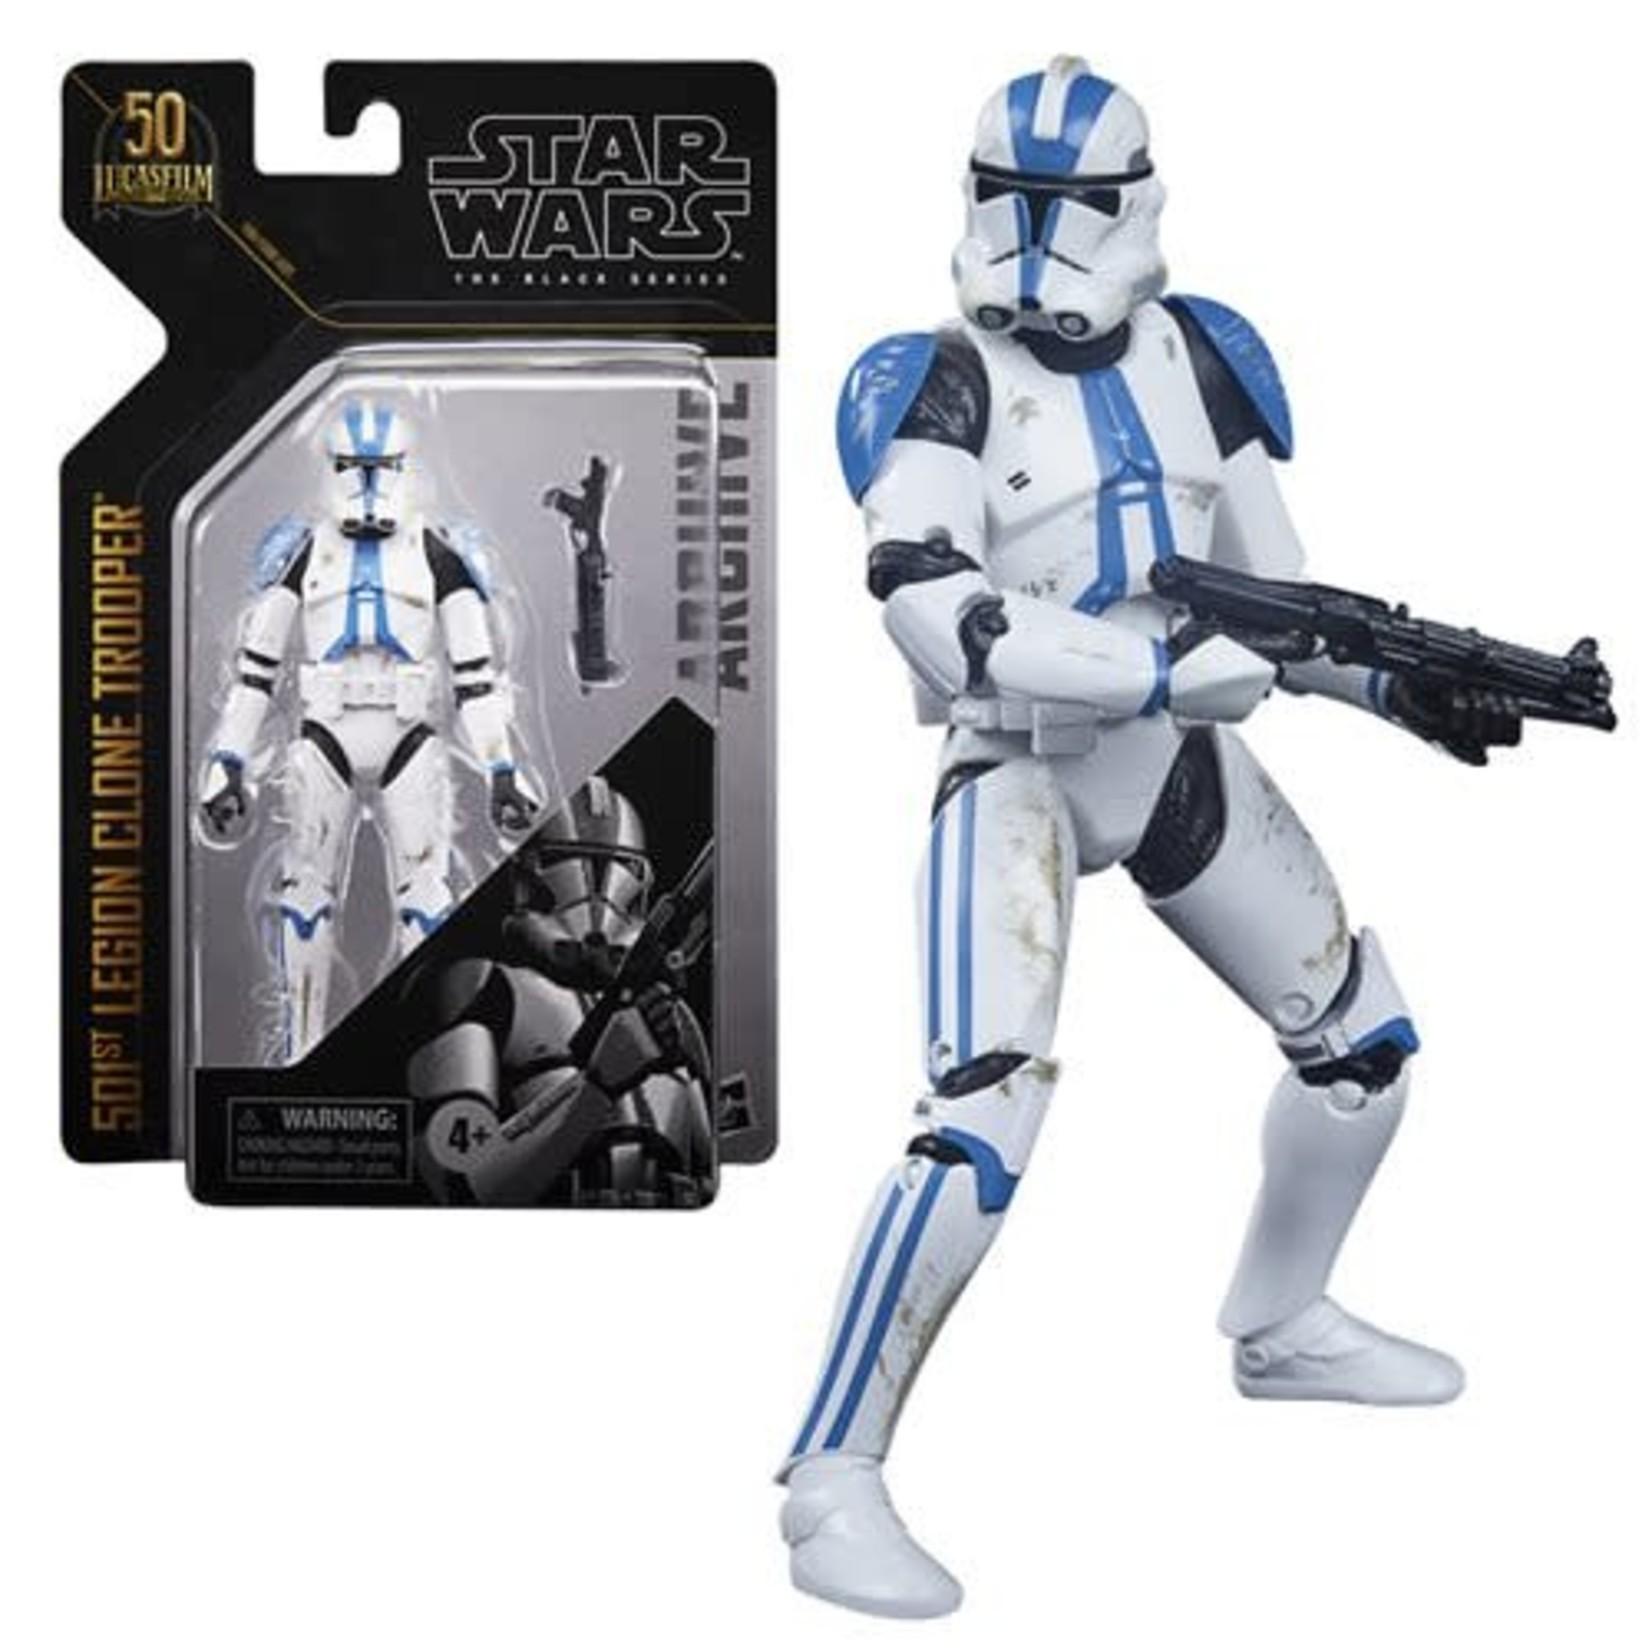 Hasbro [Preorder] Star Wars The Black Series Archive 501st Legion Clone Trooper